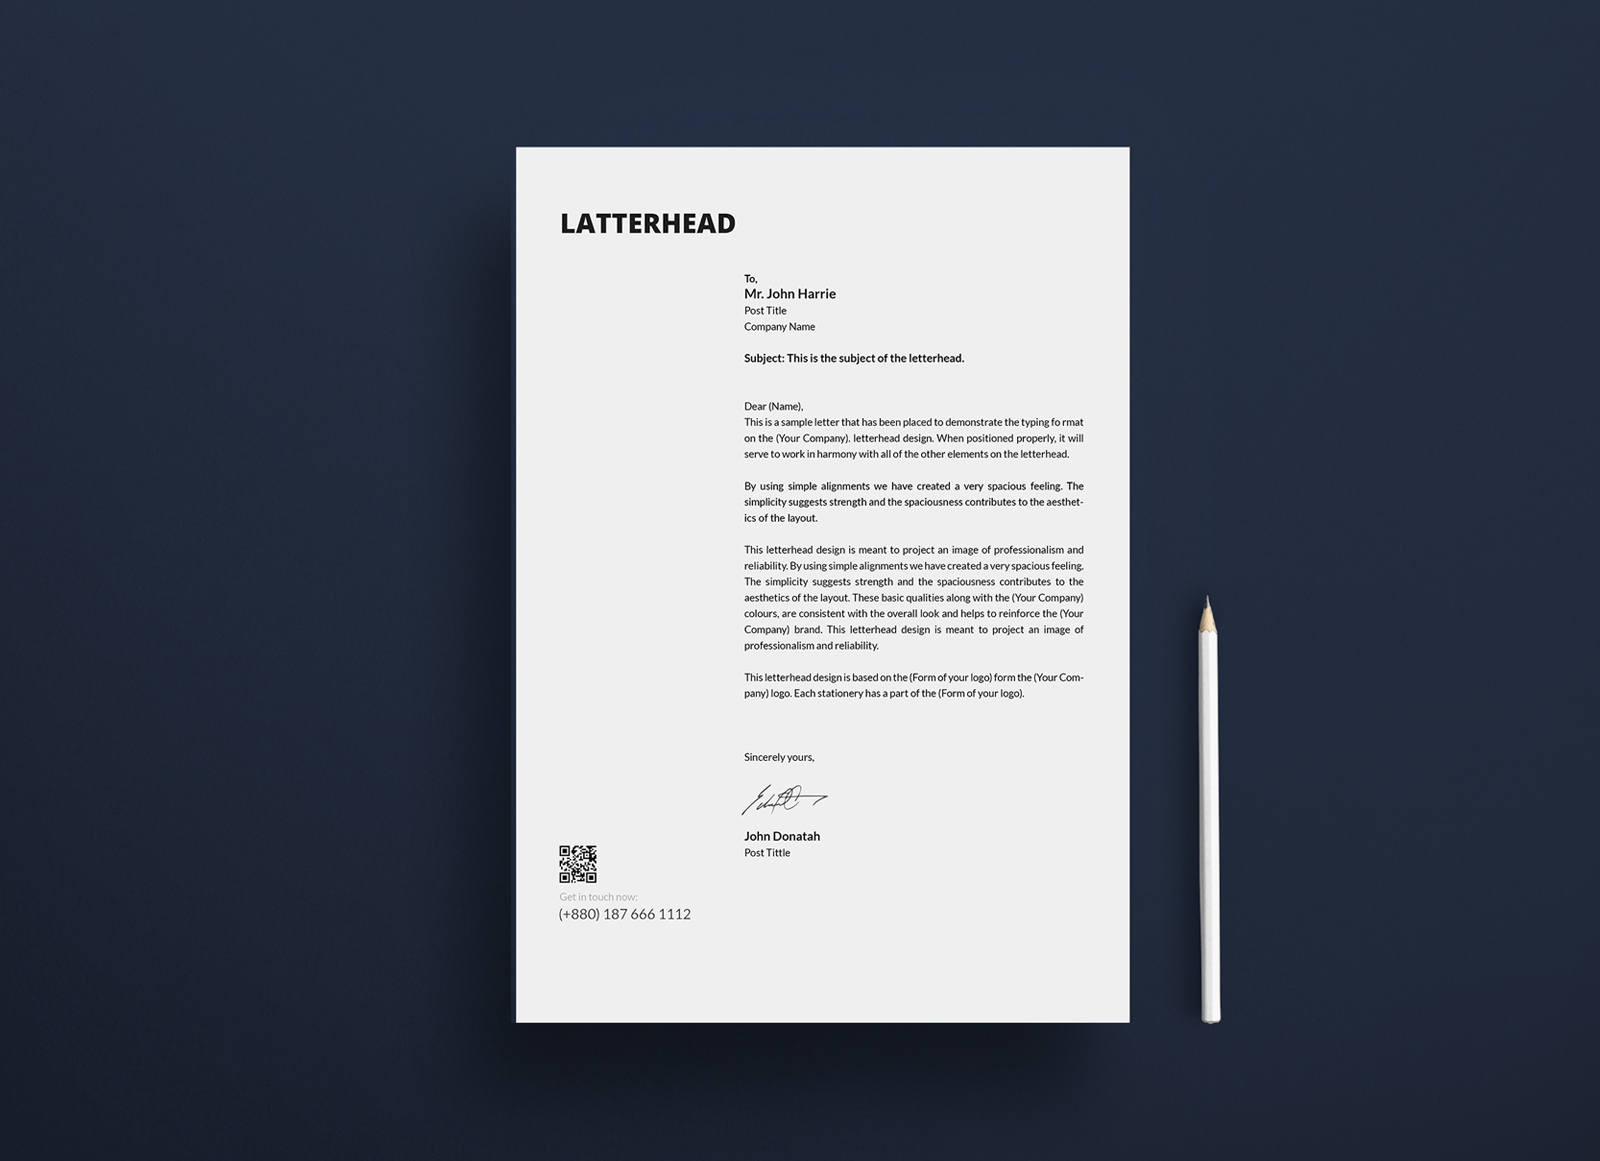 Free Letterhead Paper Mockup PSD - Good Mockups White Paper Bag Texture